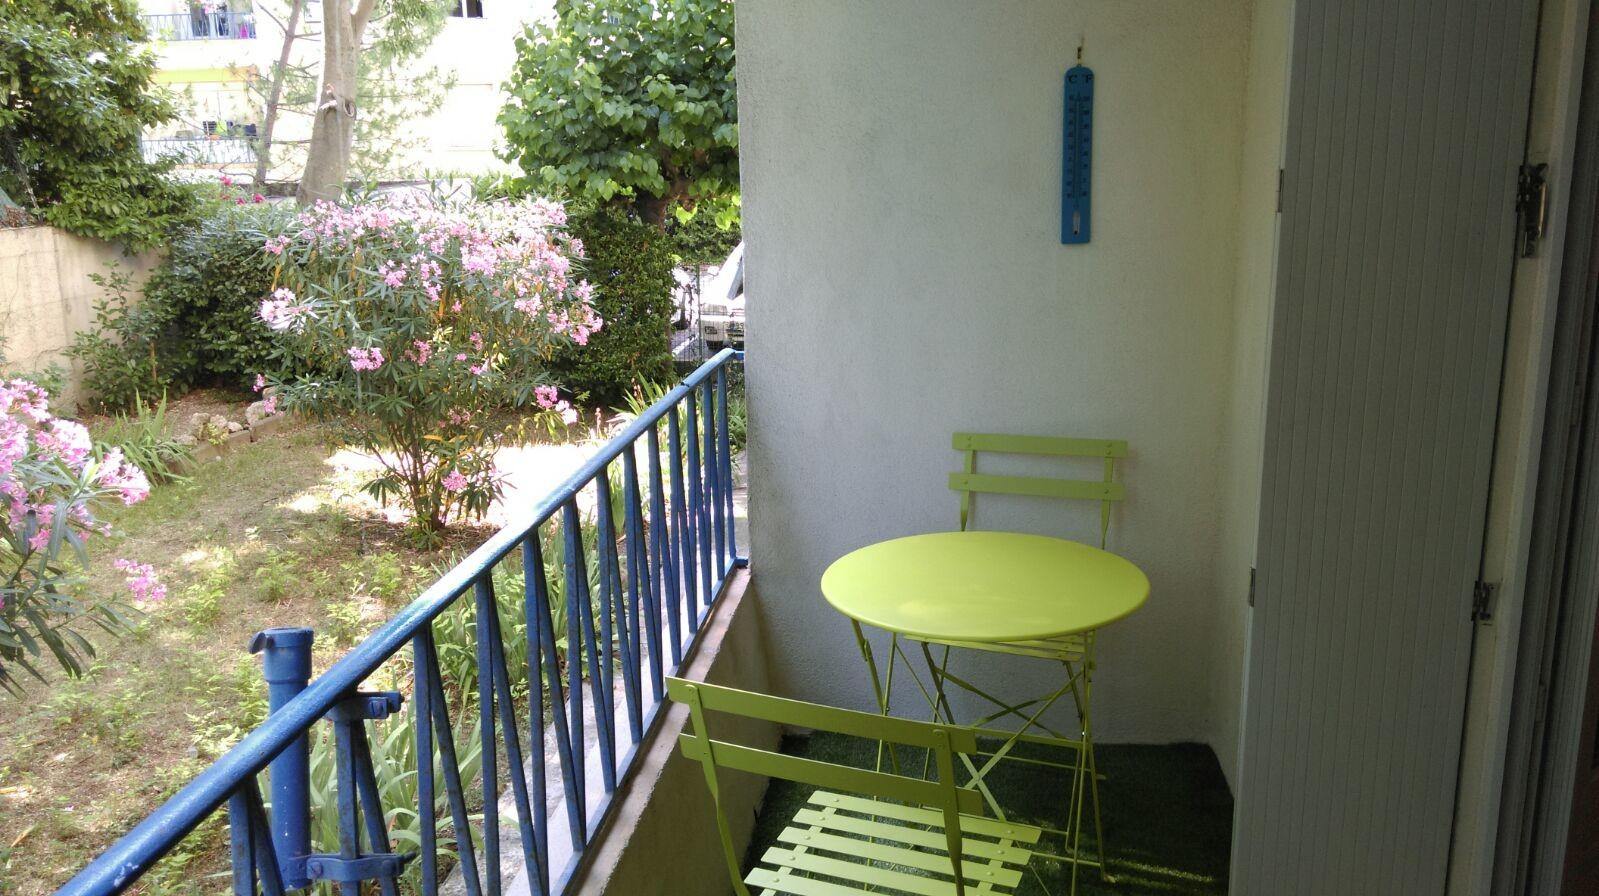 180 Rue René Laennec, 34090 Montpellier, France